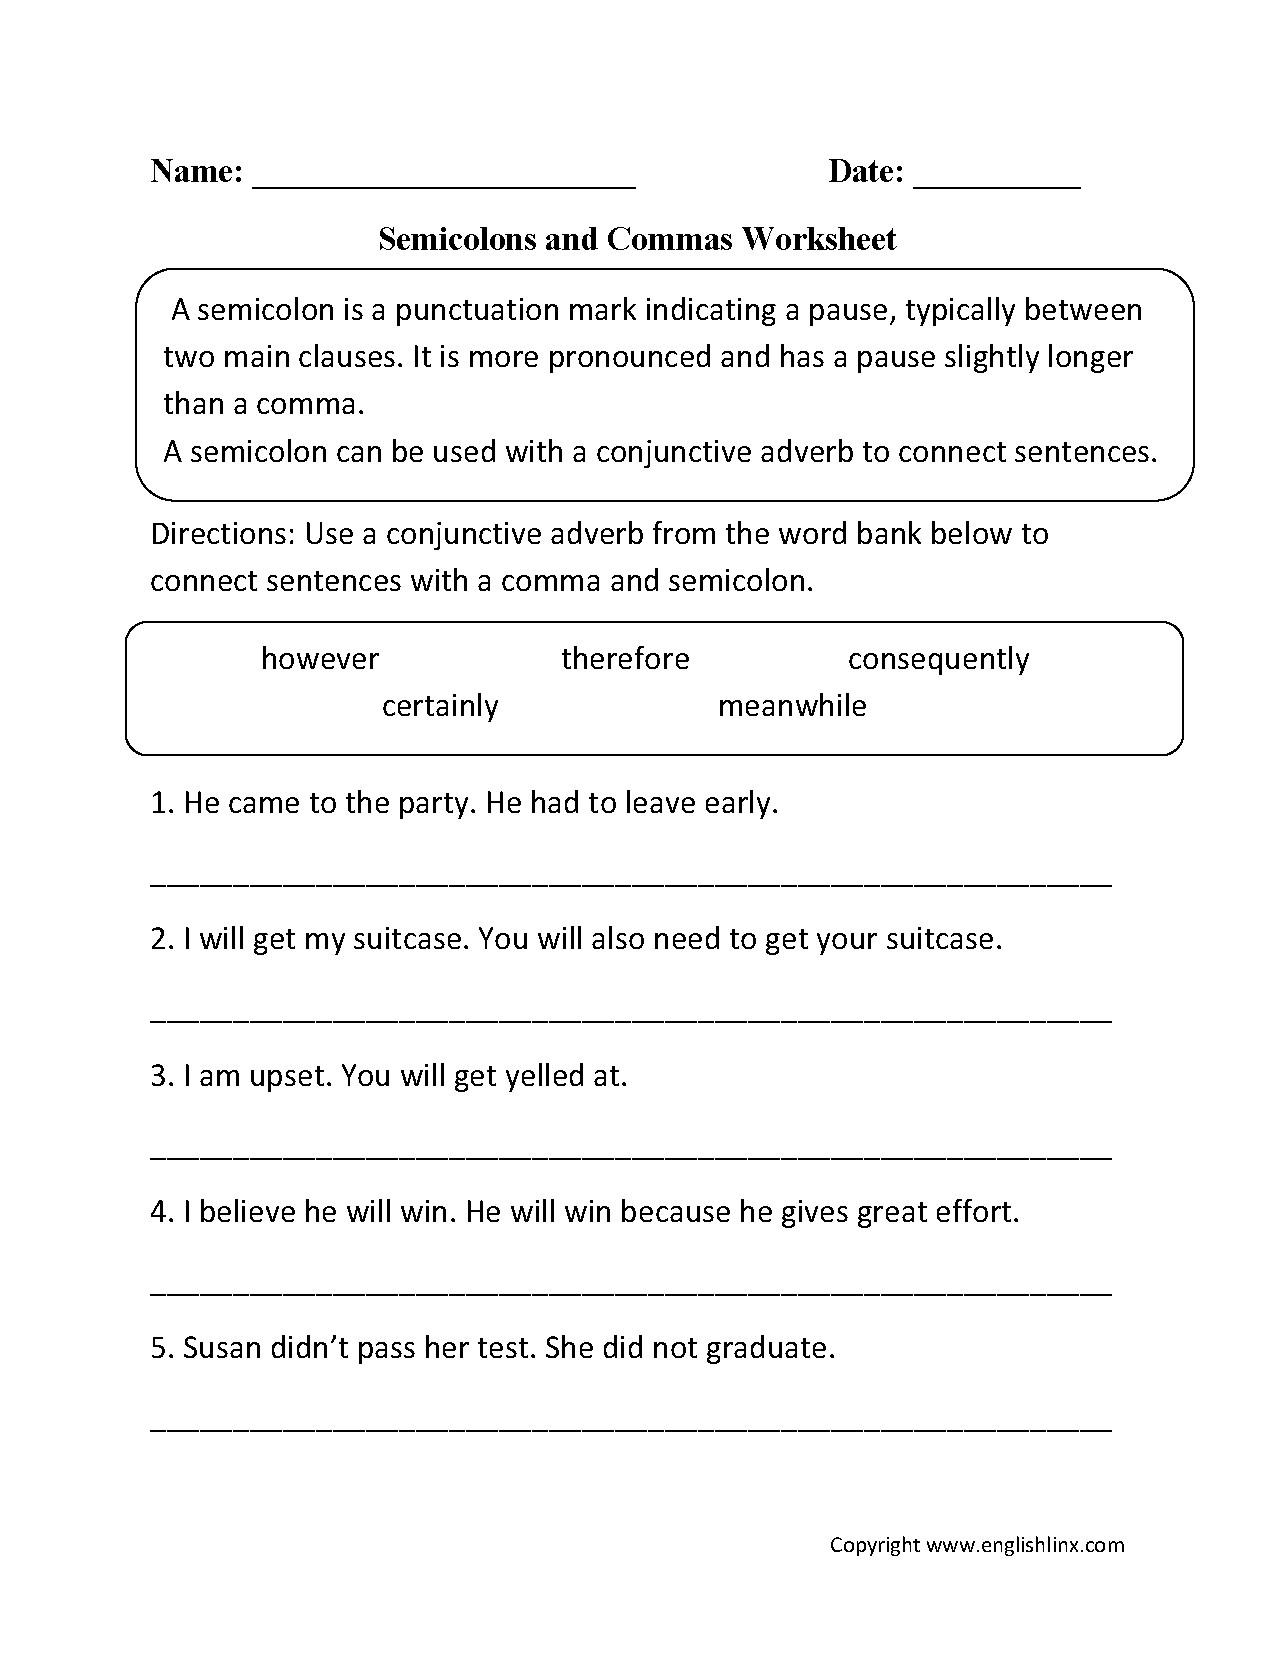 Semicolon and Colon Worksheet